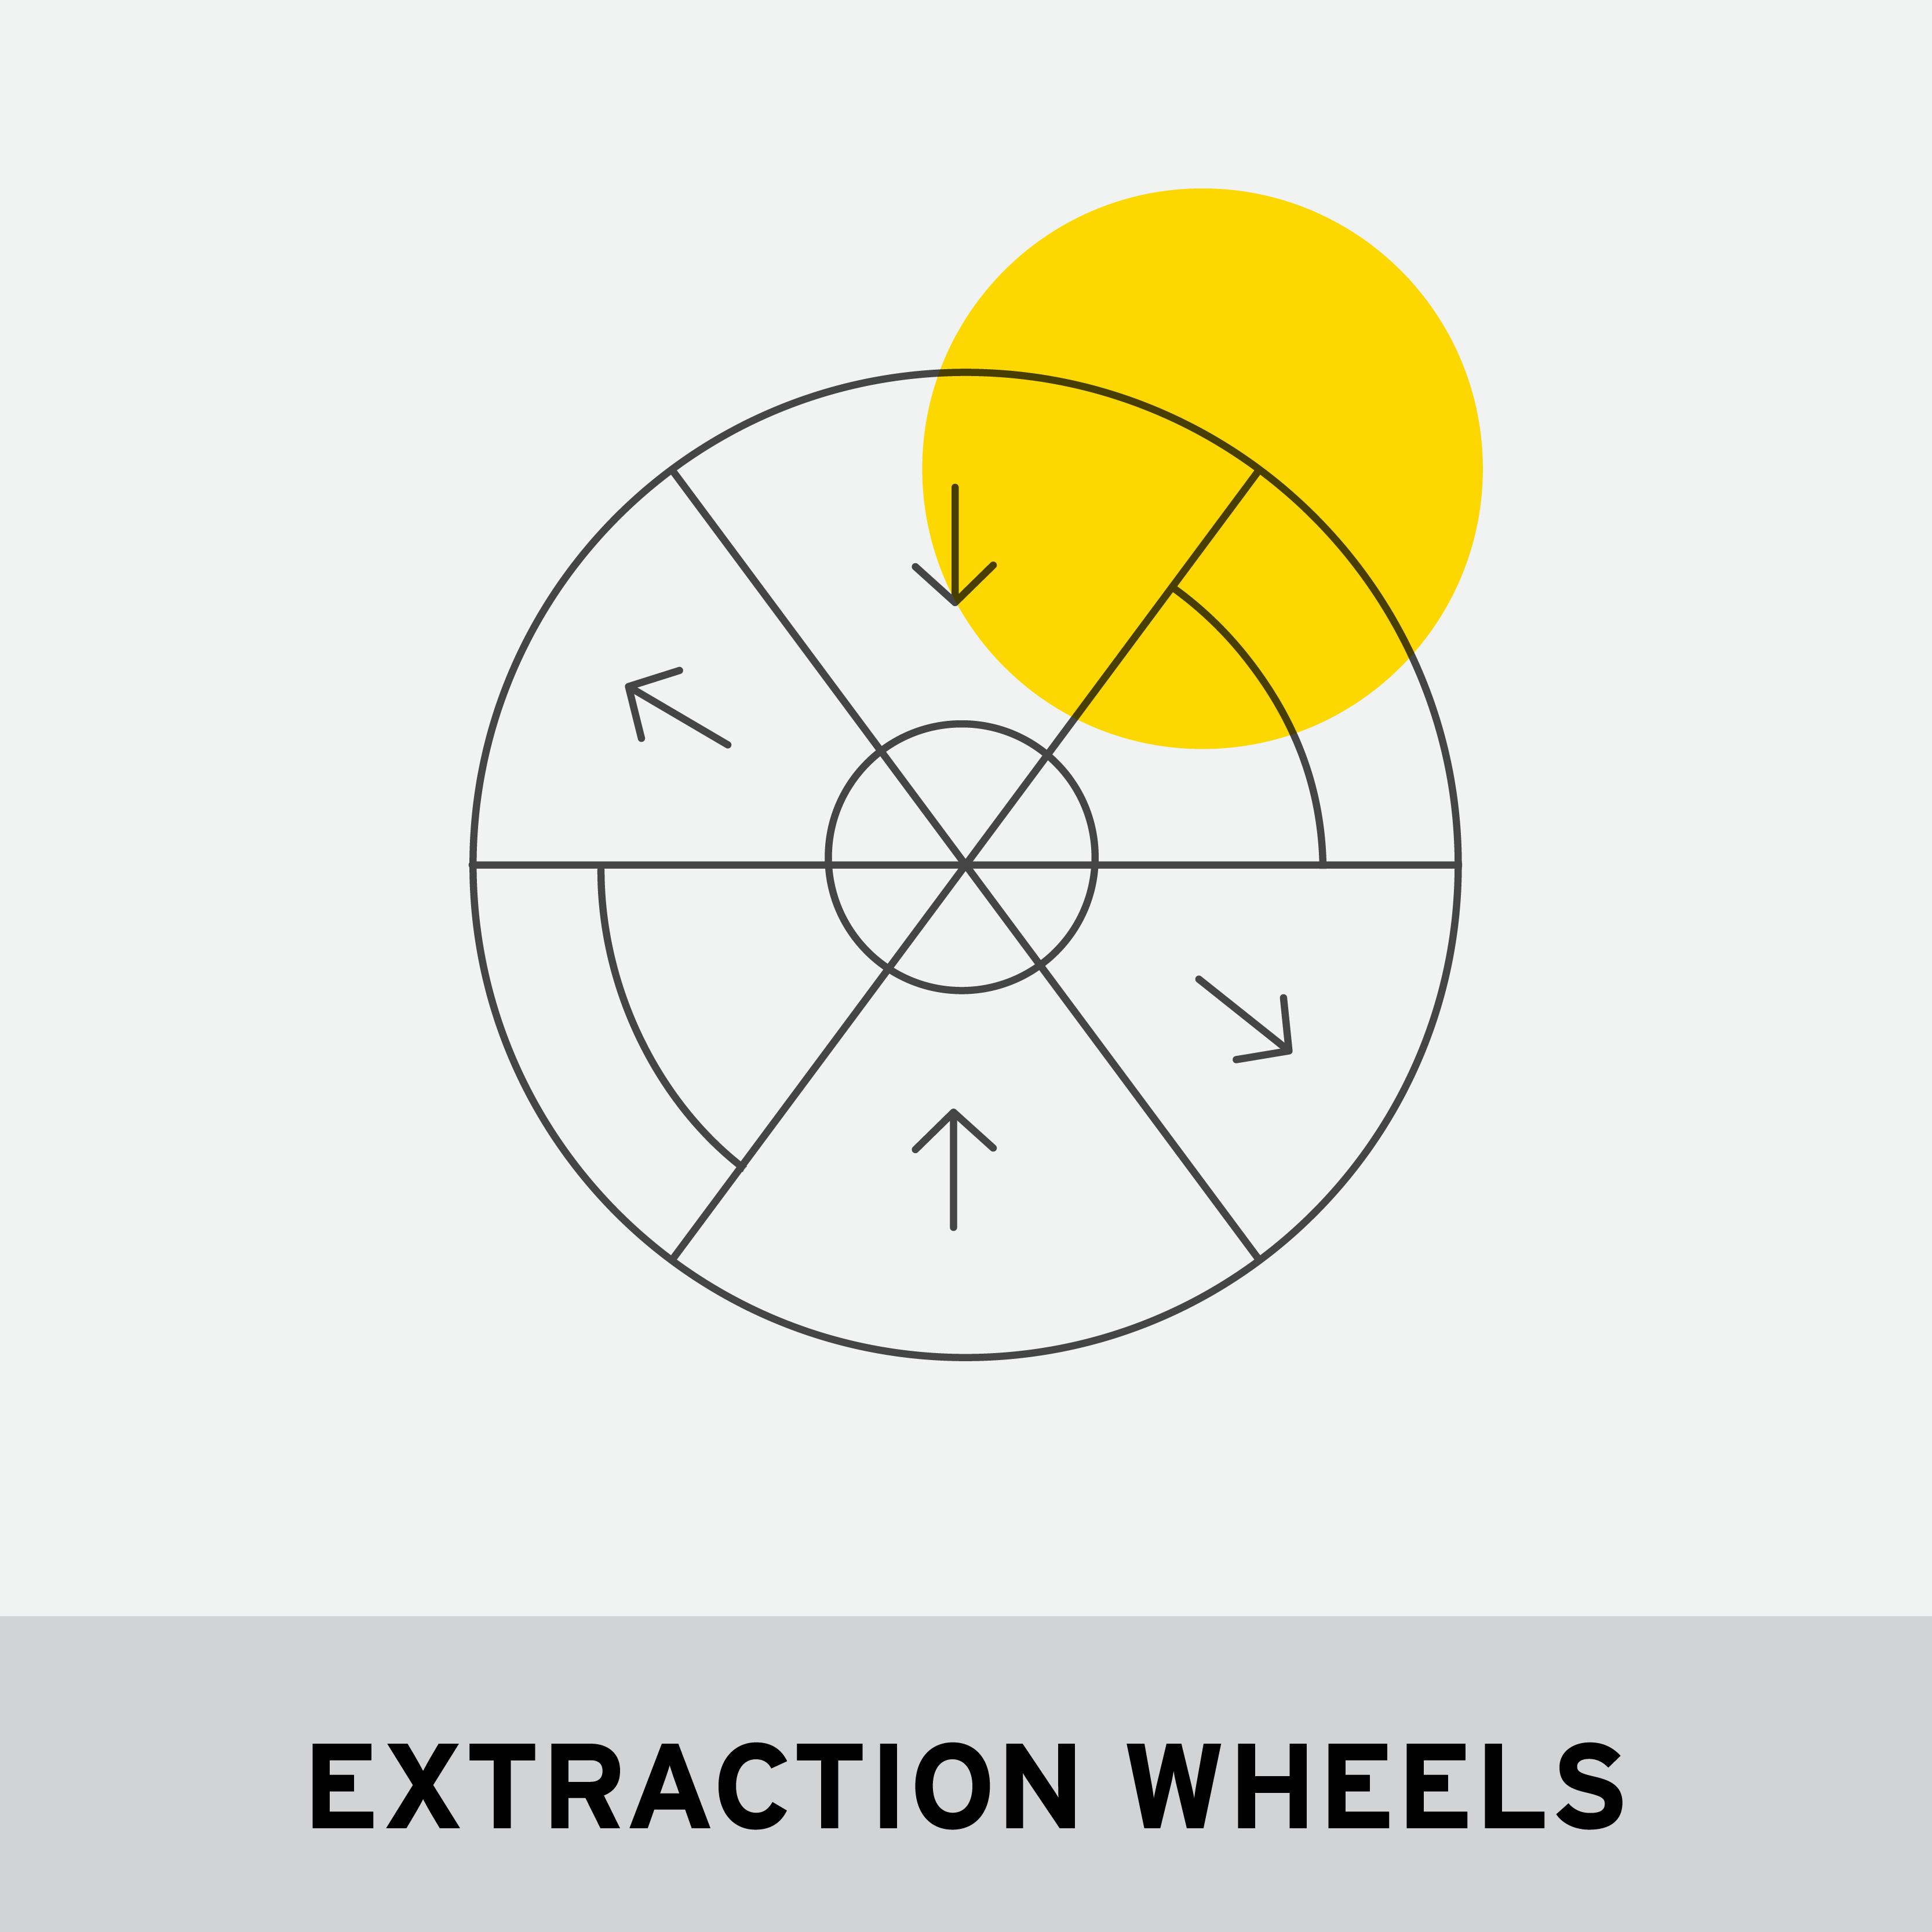 EXTRACTION WHEELS